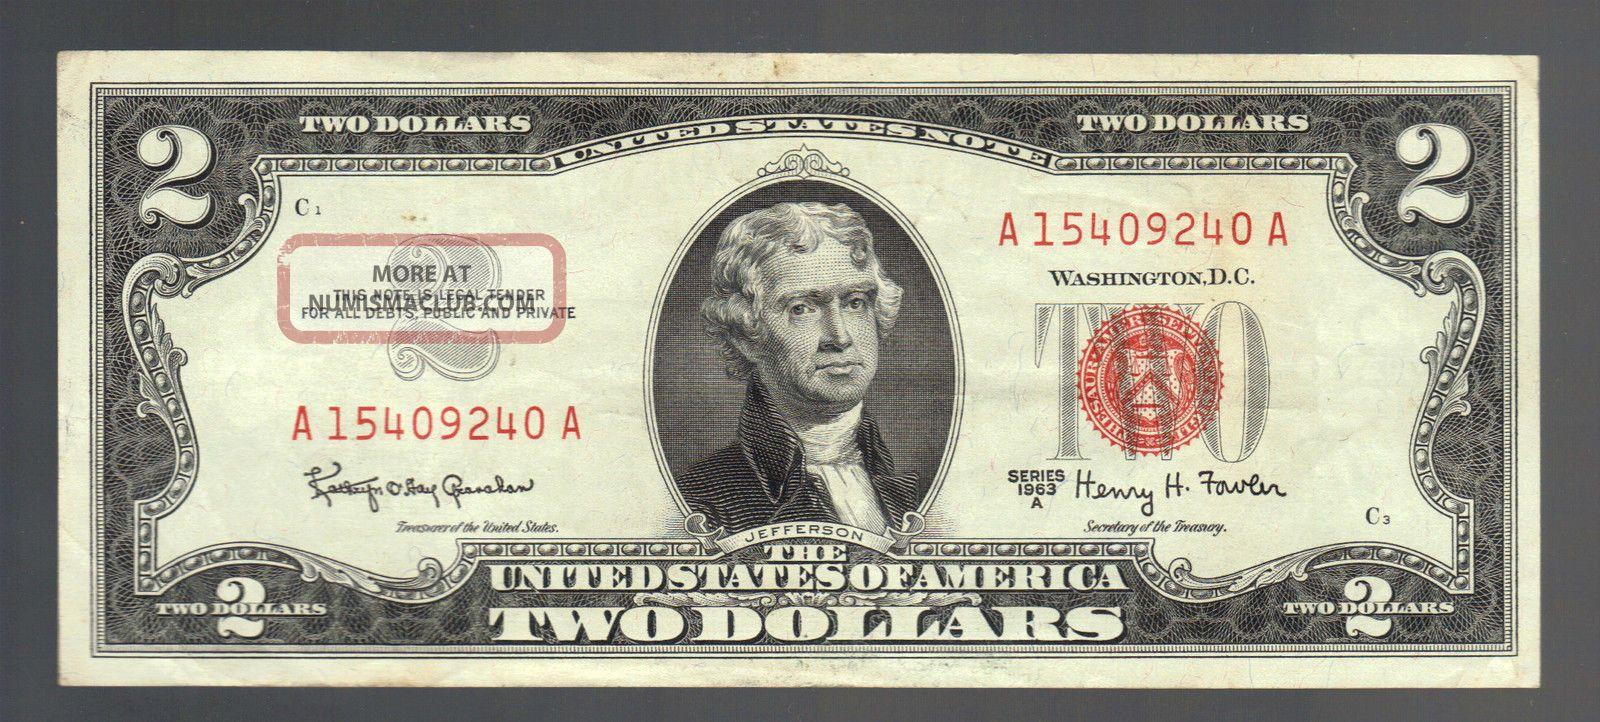 Crisp Us $2 Dollar 1963a Red Seal Old Legal Tender United